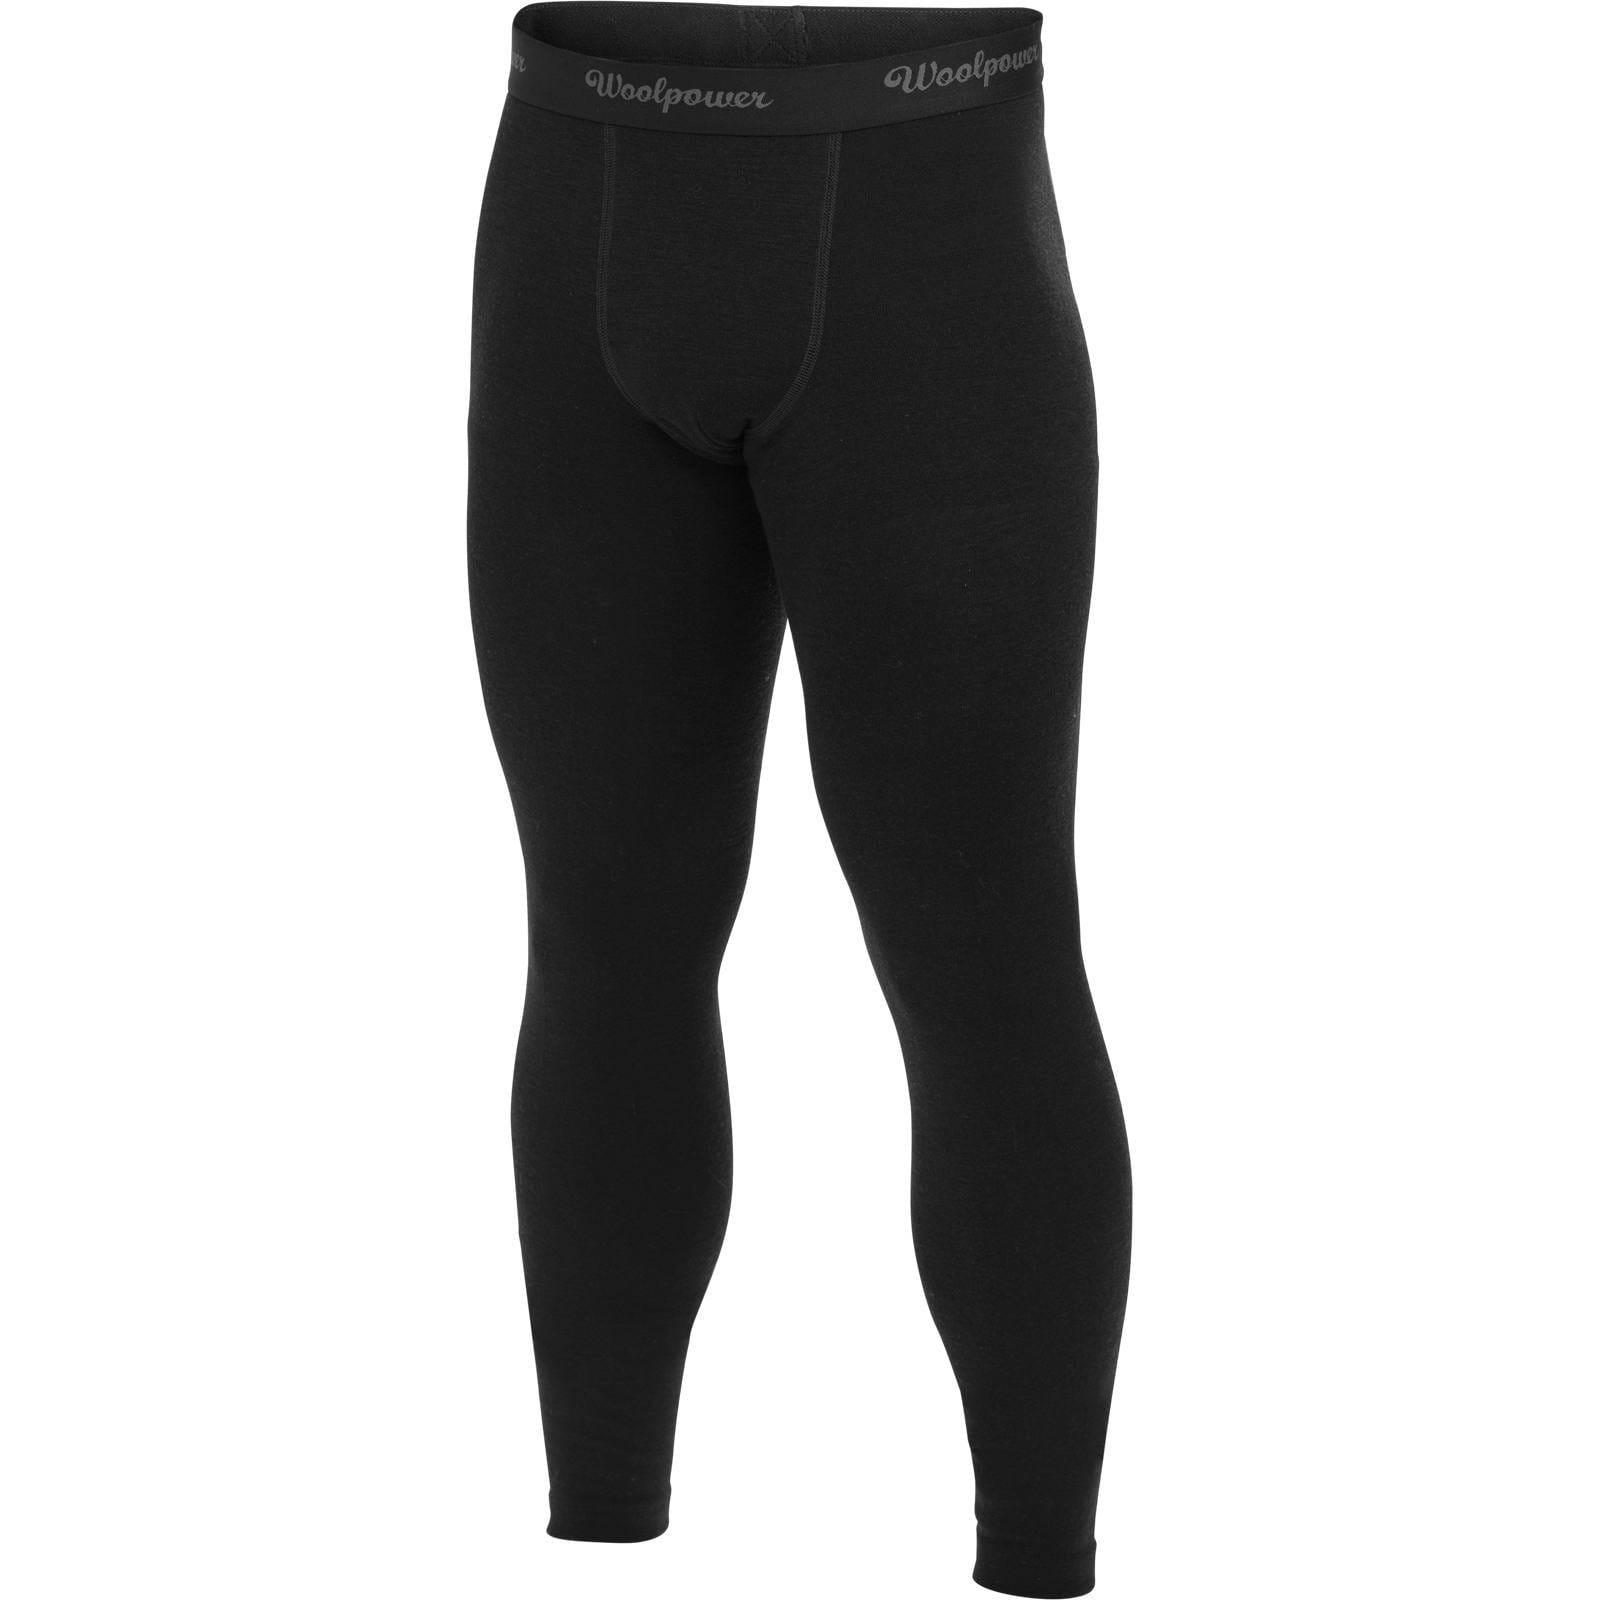 Woolpower Long Johns Men's LITE black XL